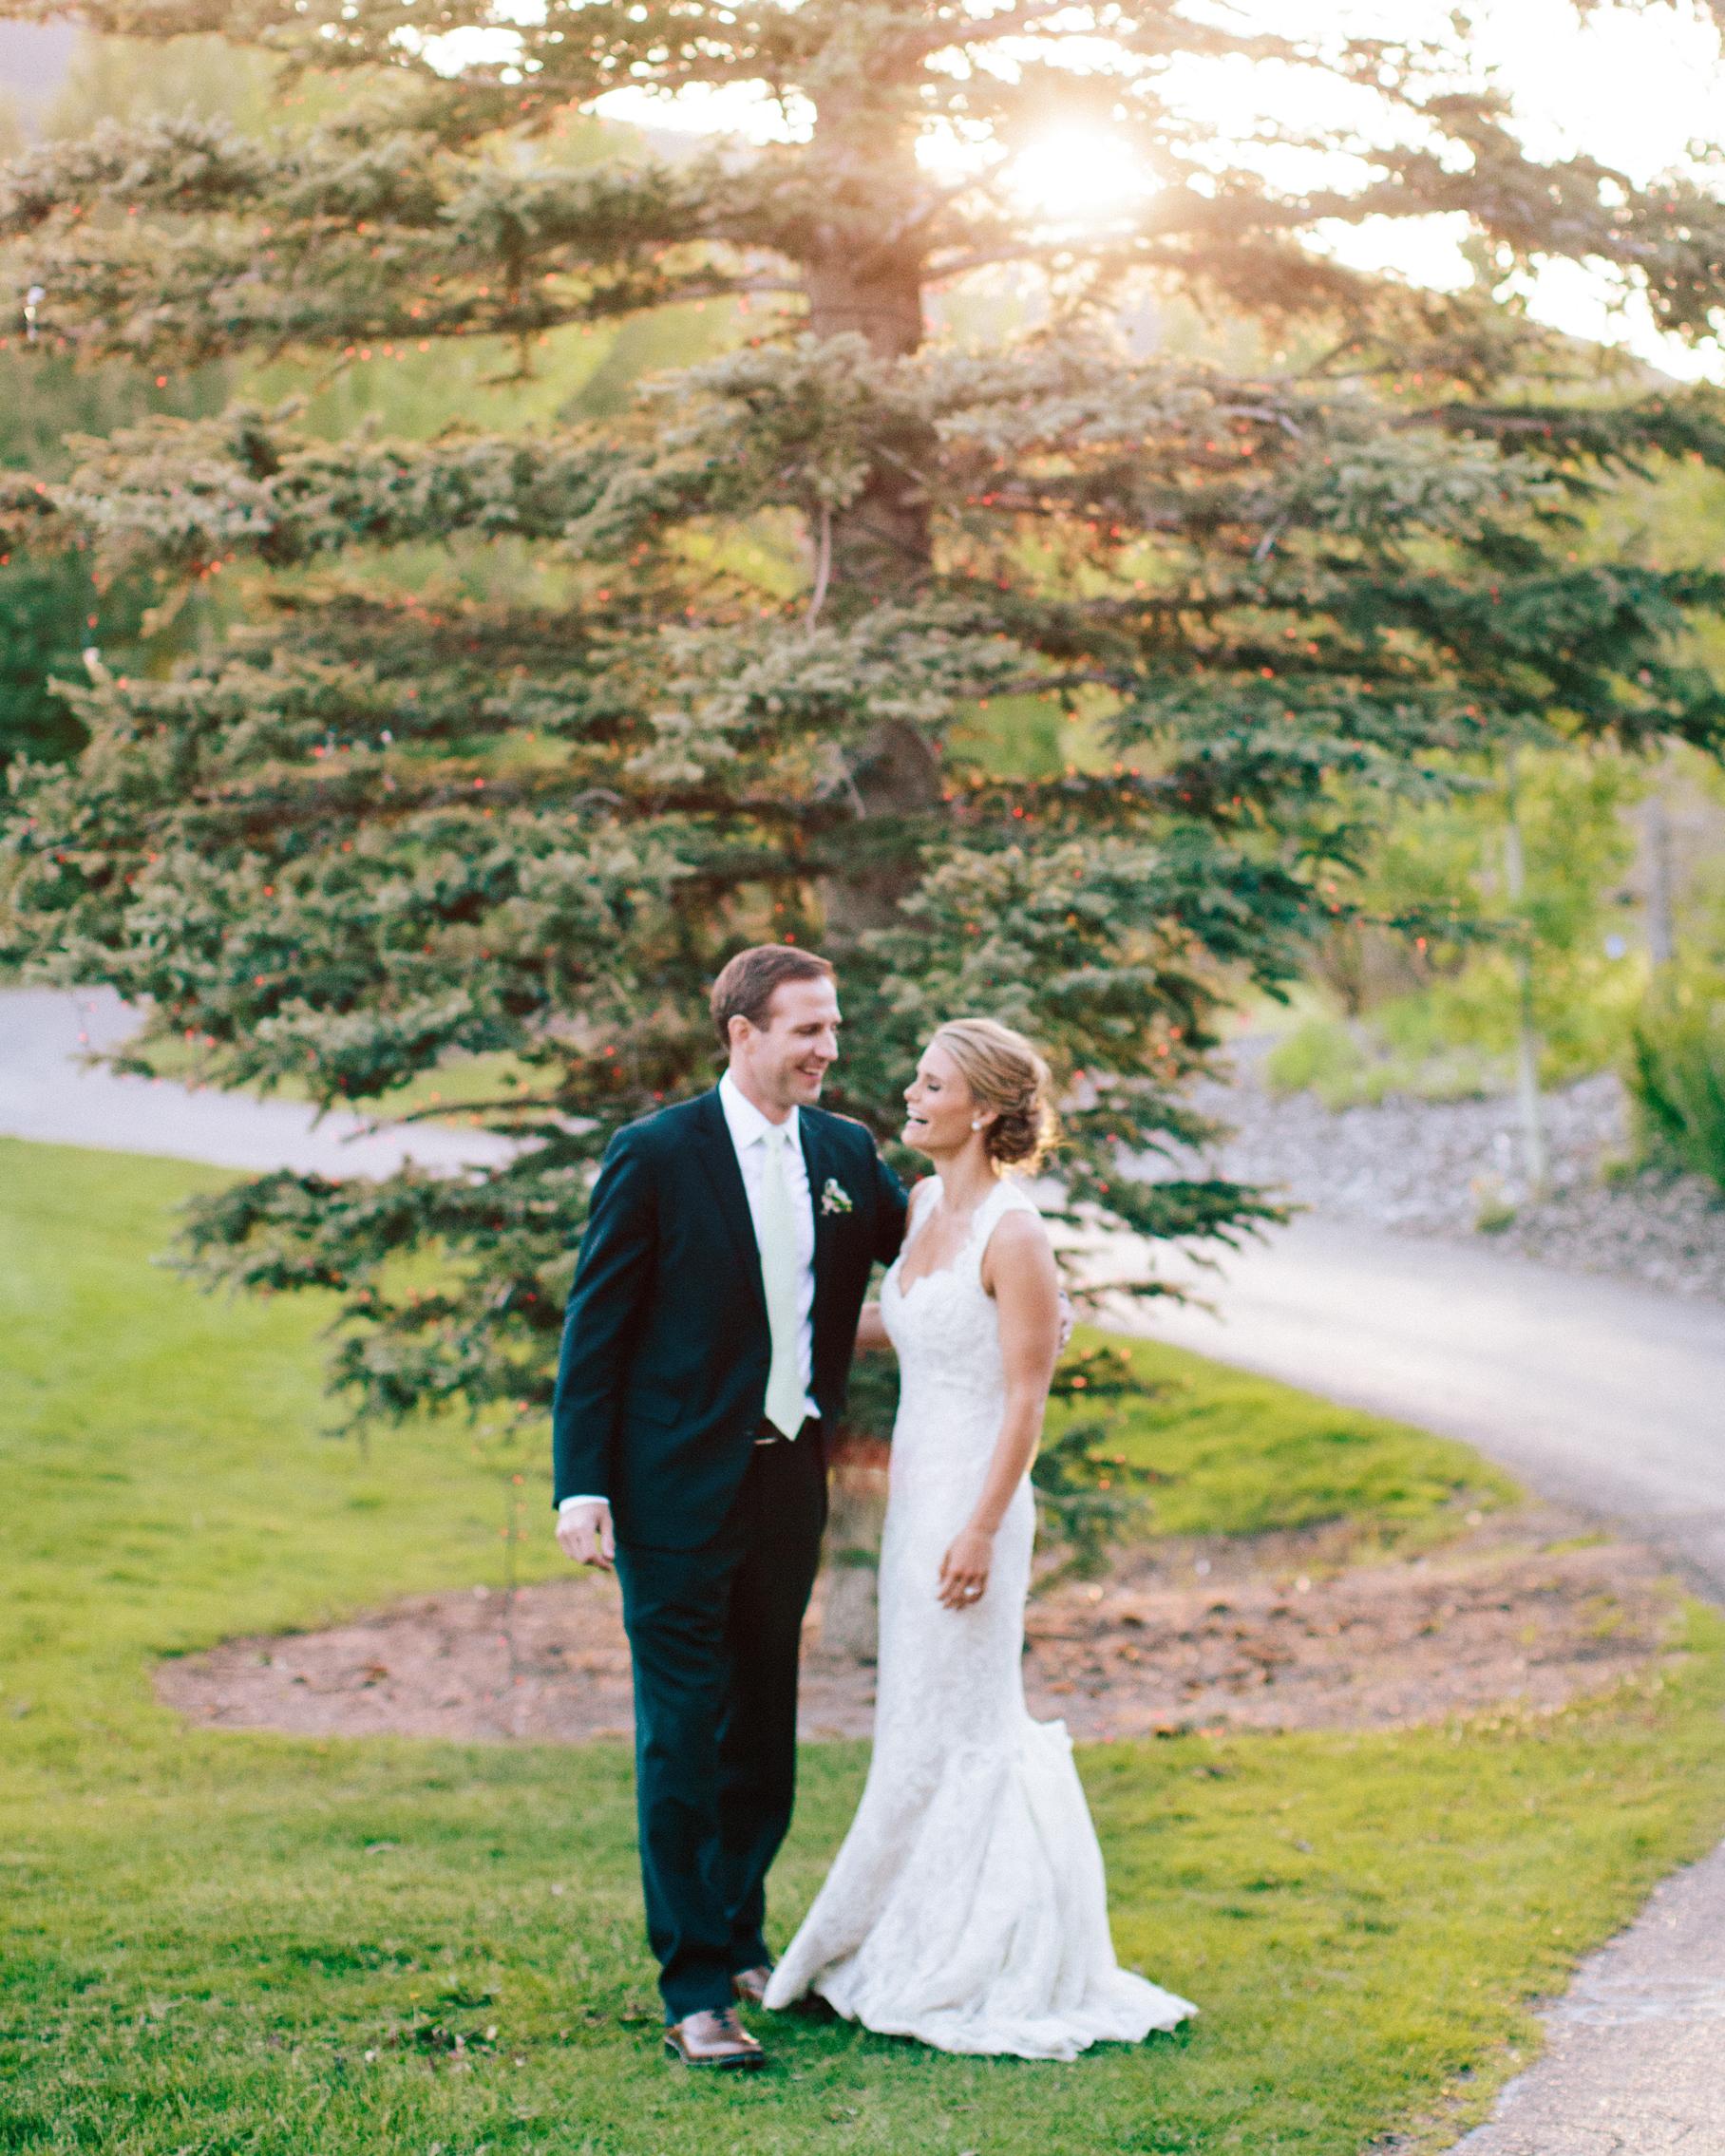 jamie-alex-wedding-couple-164-s111544-1014.jpg